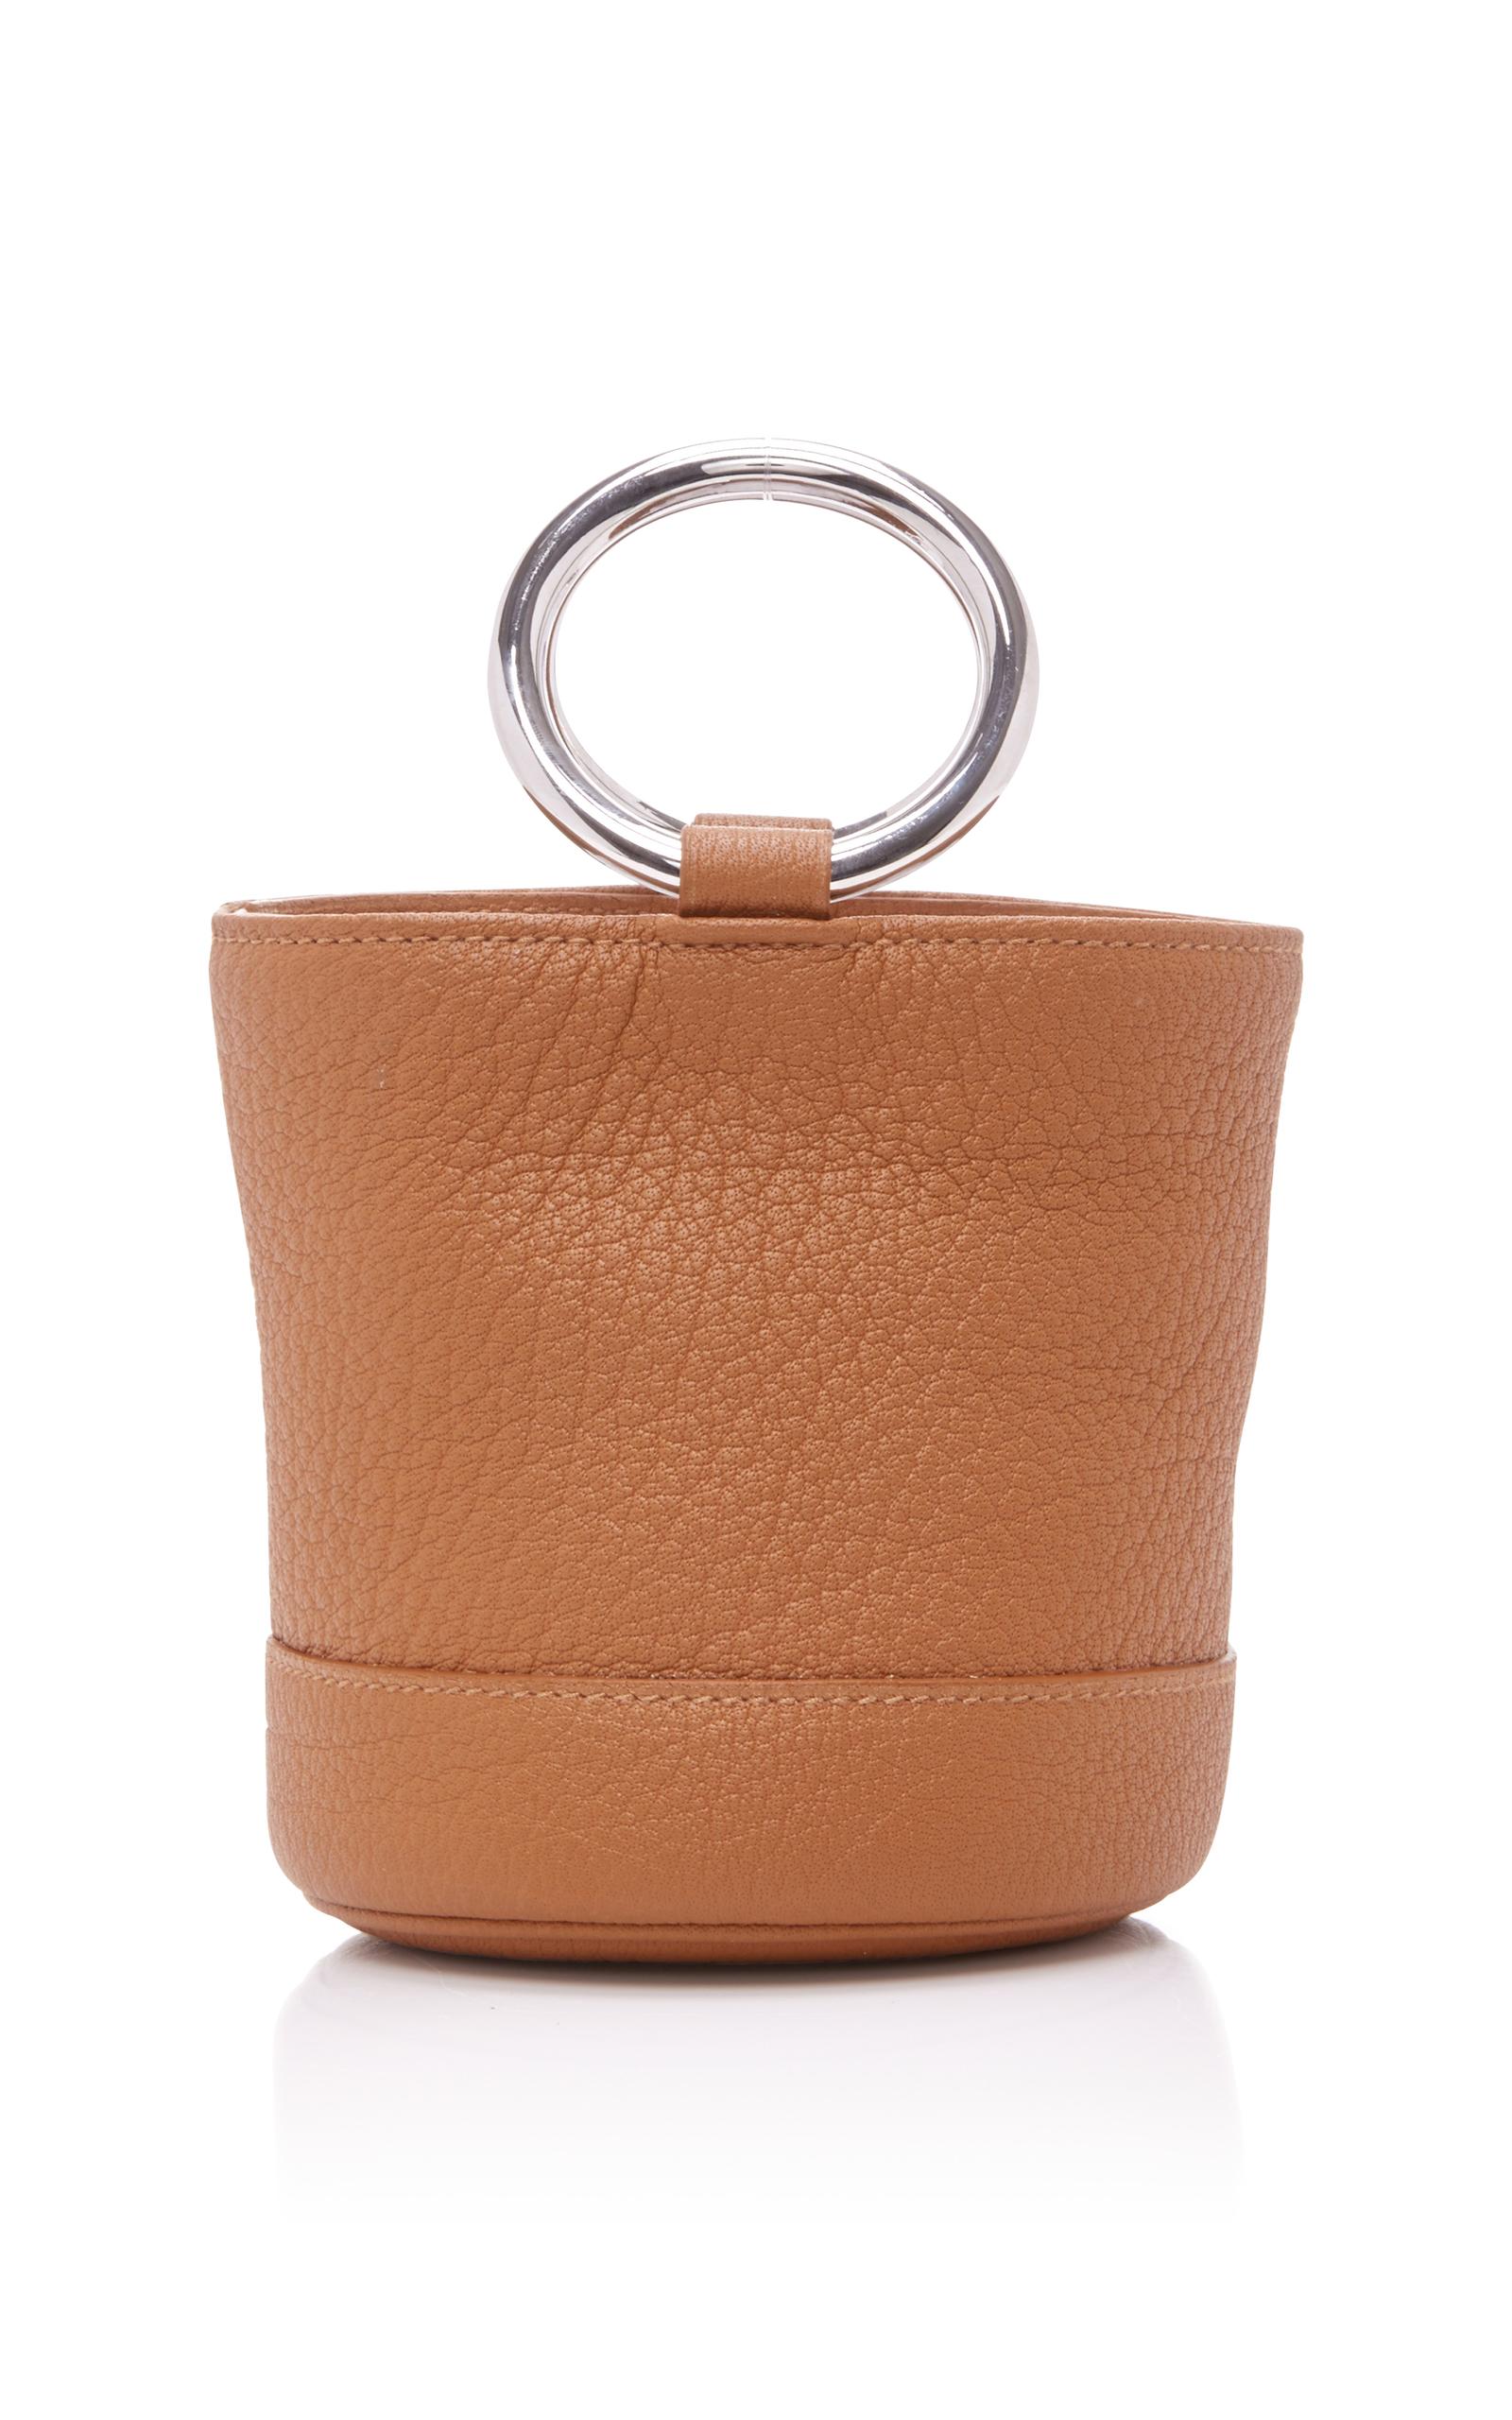 4d27ccd5ed3 Bonsai 15 Bucket Bag with Strap by Simon Miller | Moda Operandi